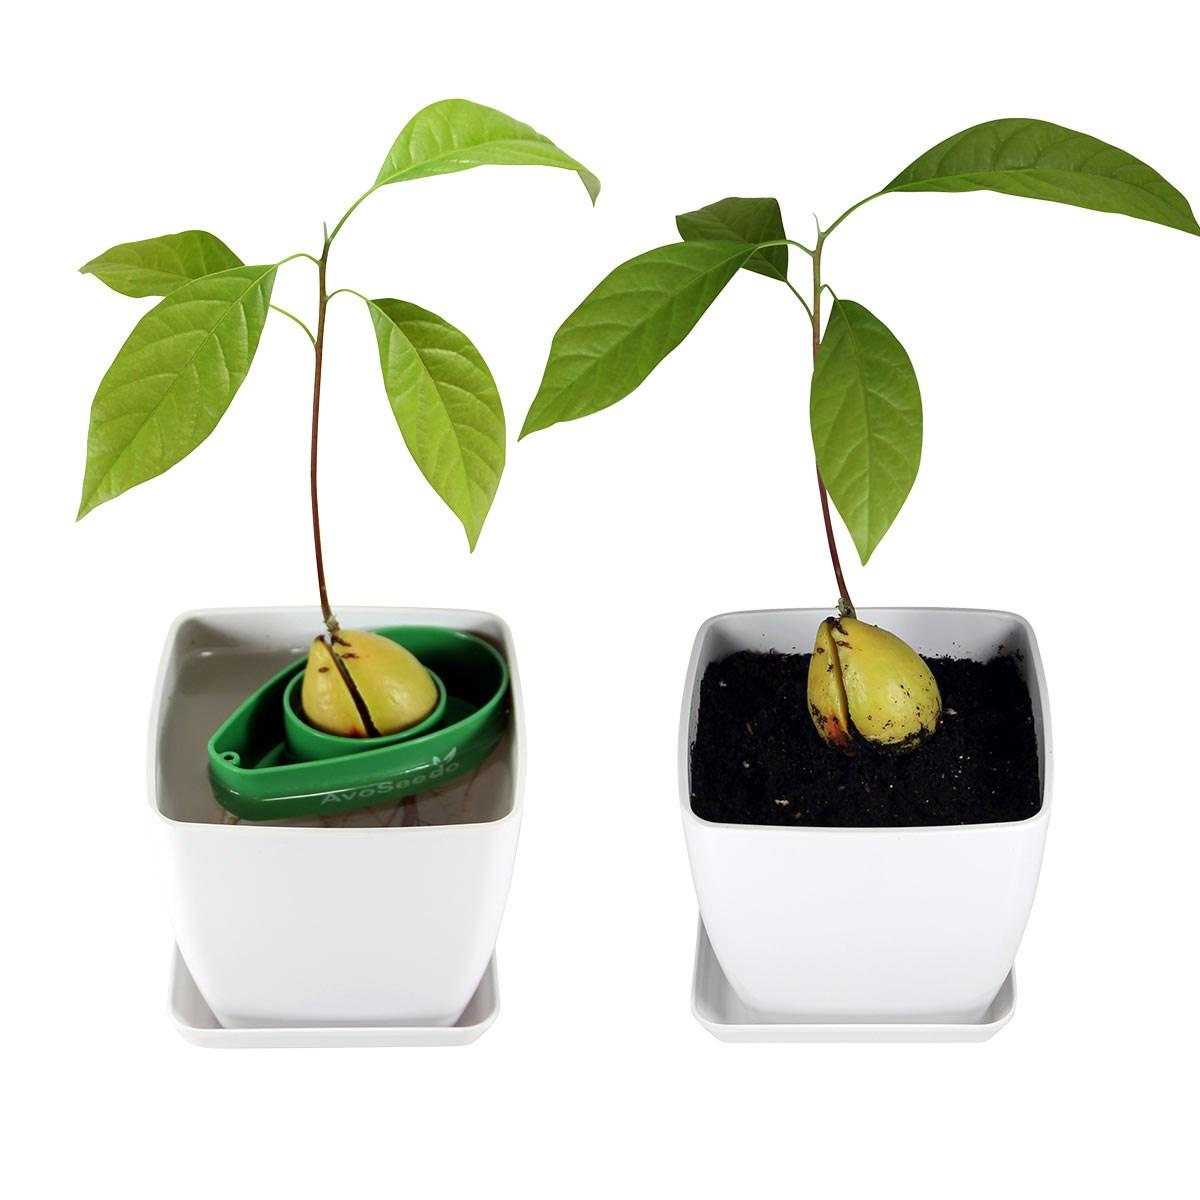 How To Make An Avocado Tree Bear Fruit